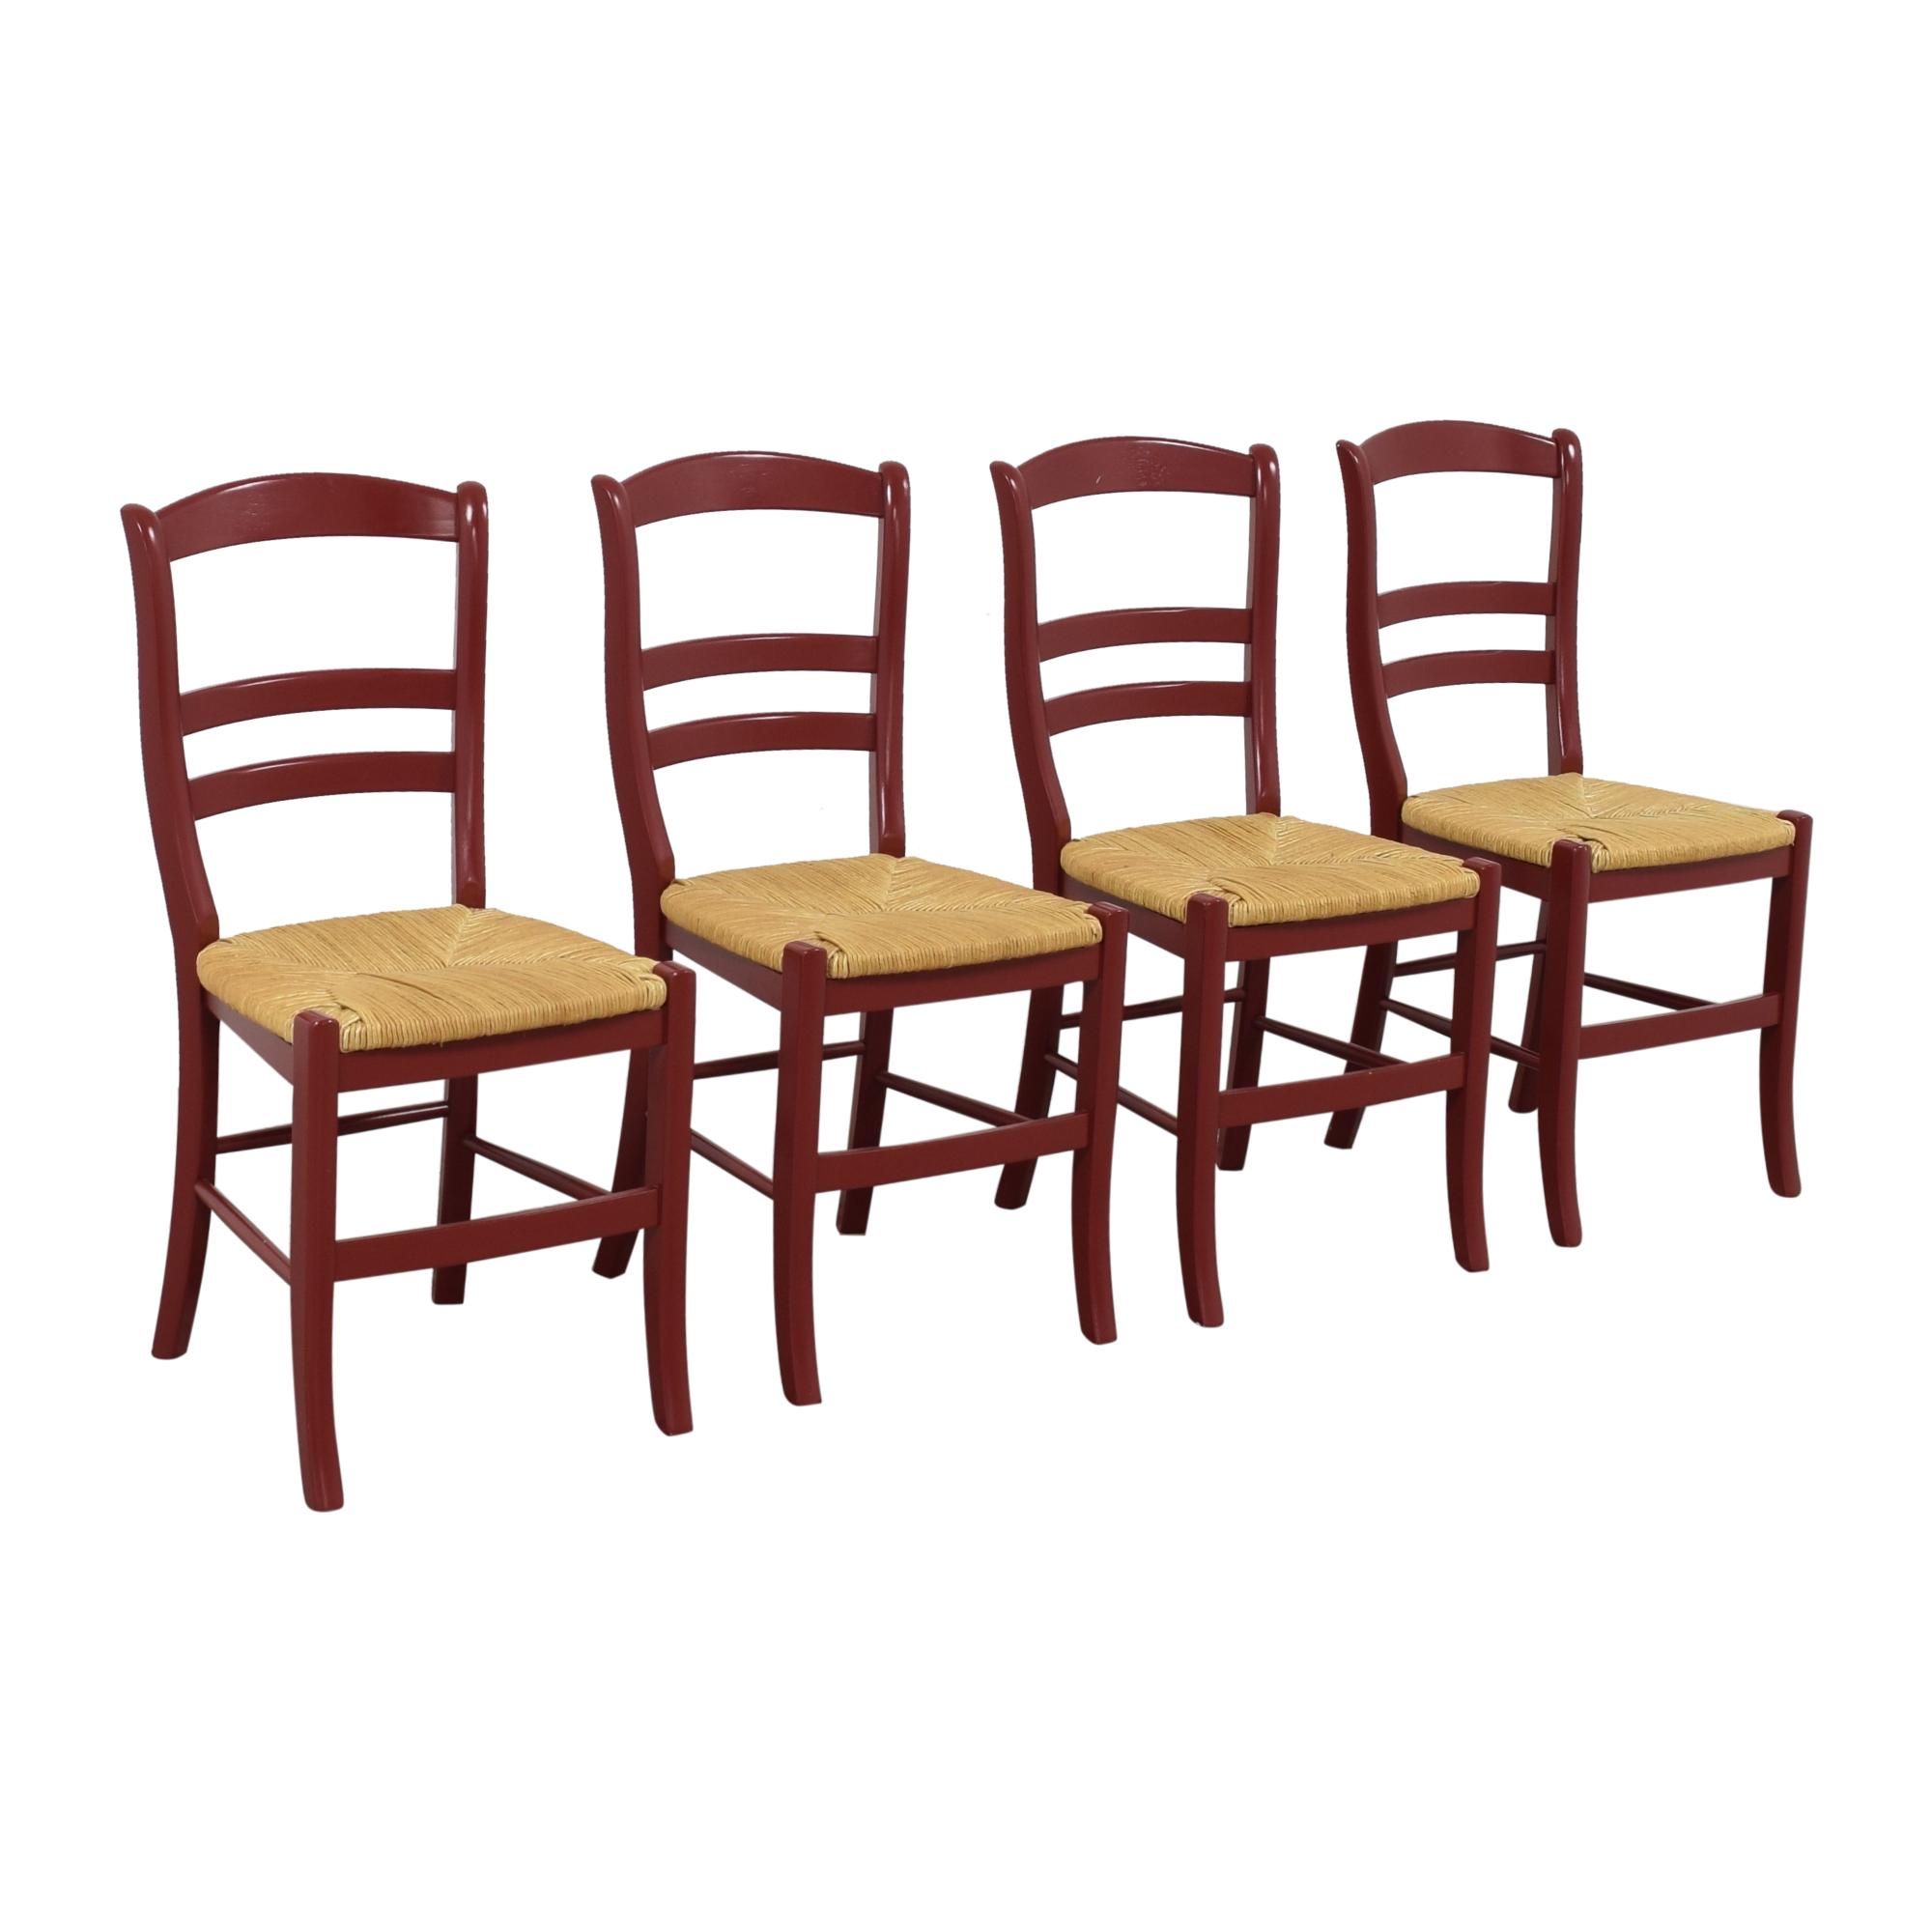 Pottery Barn Pottery Barn Isabella Dining Chairs nj